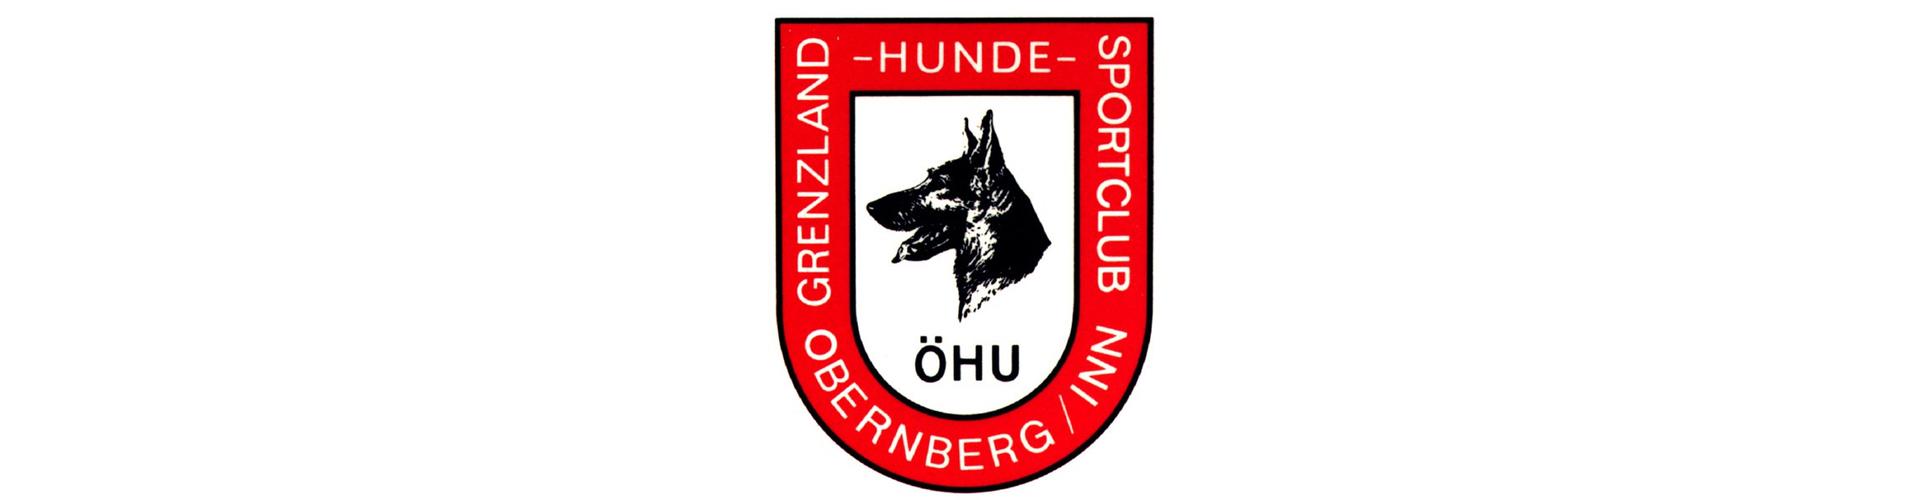 GHSC OBERNBERG